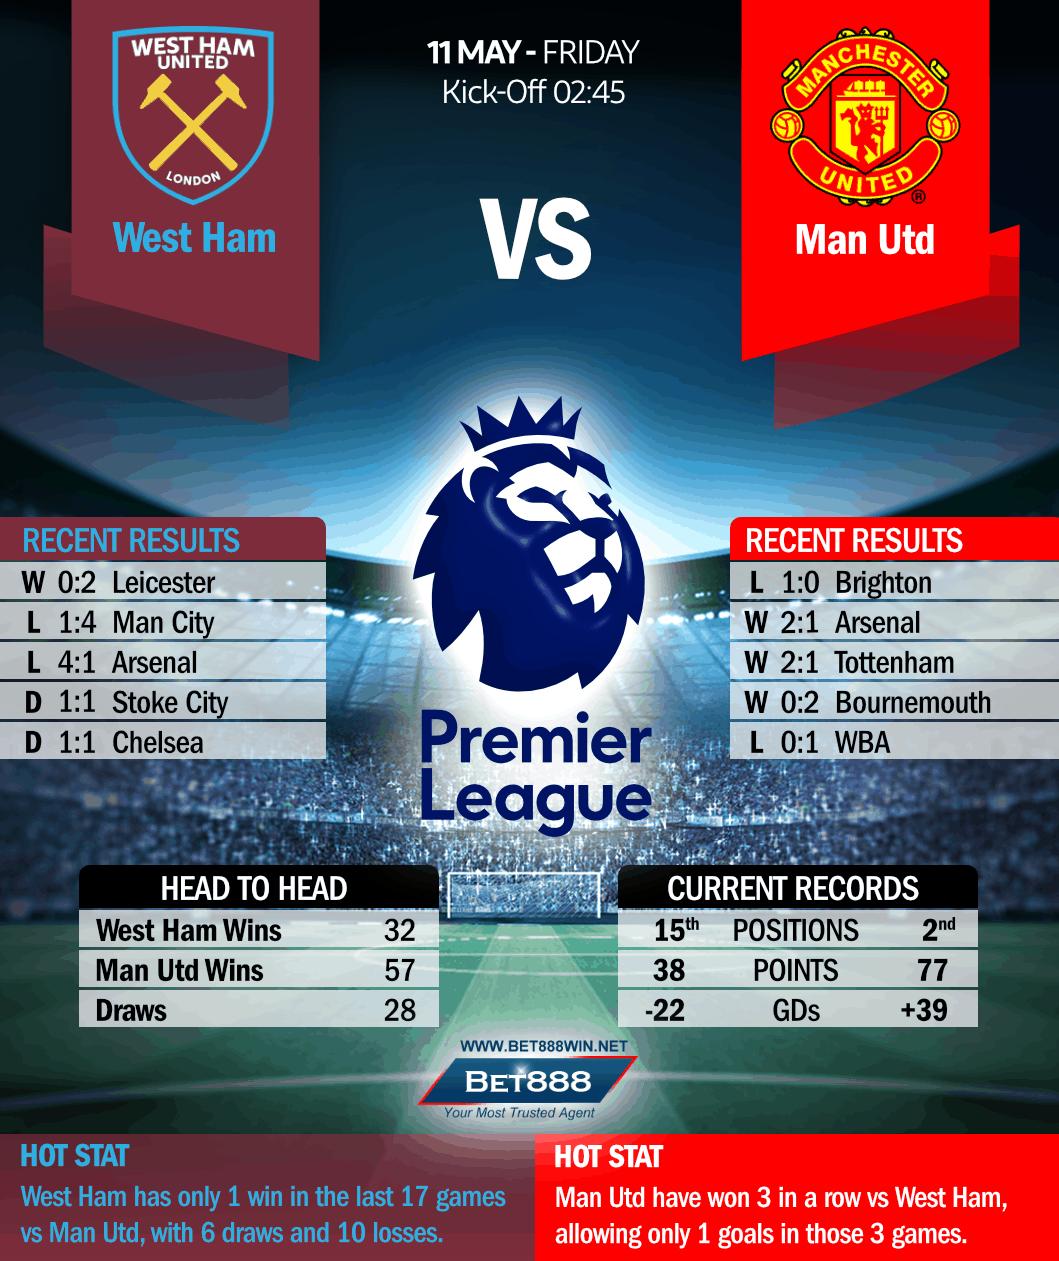 West Ham United vs Manchester United 11/05/18